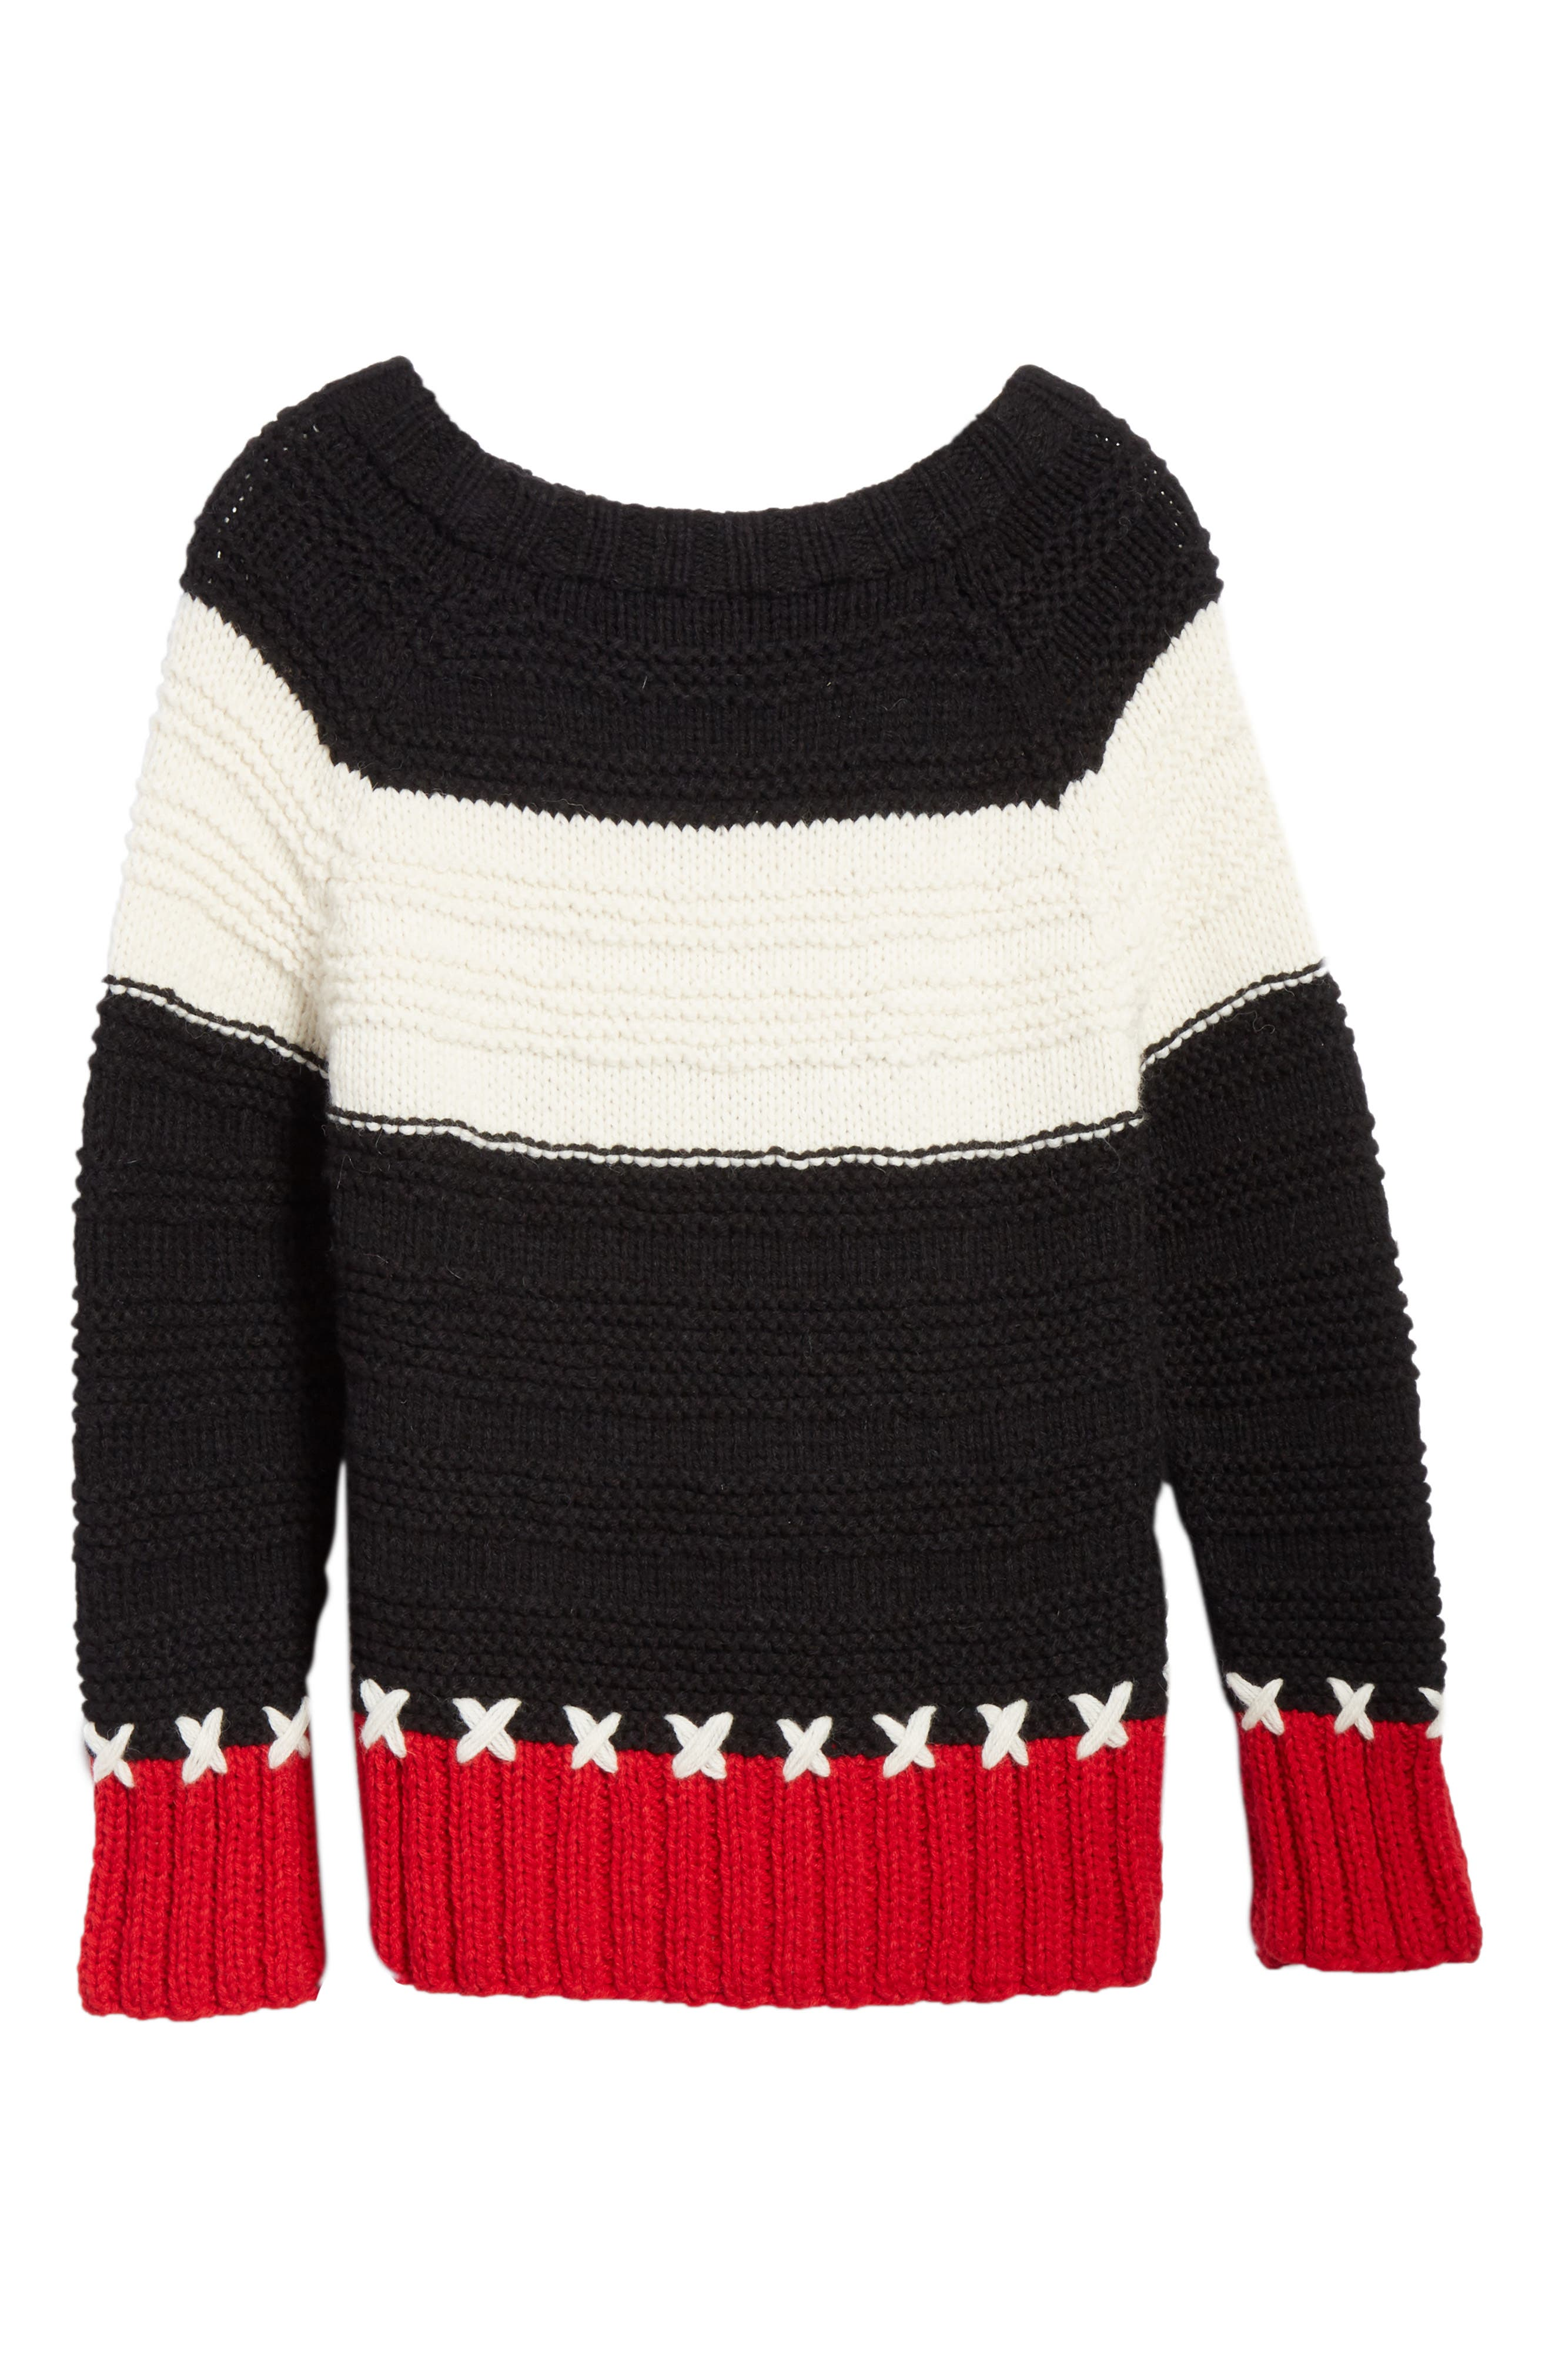 SMYTHE,                             Stripe Cross Stitched Alpaca Blend Sweater,                             Alternate thumbnail 6, color,                             001